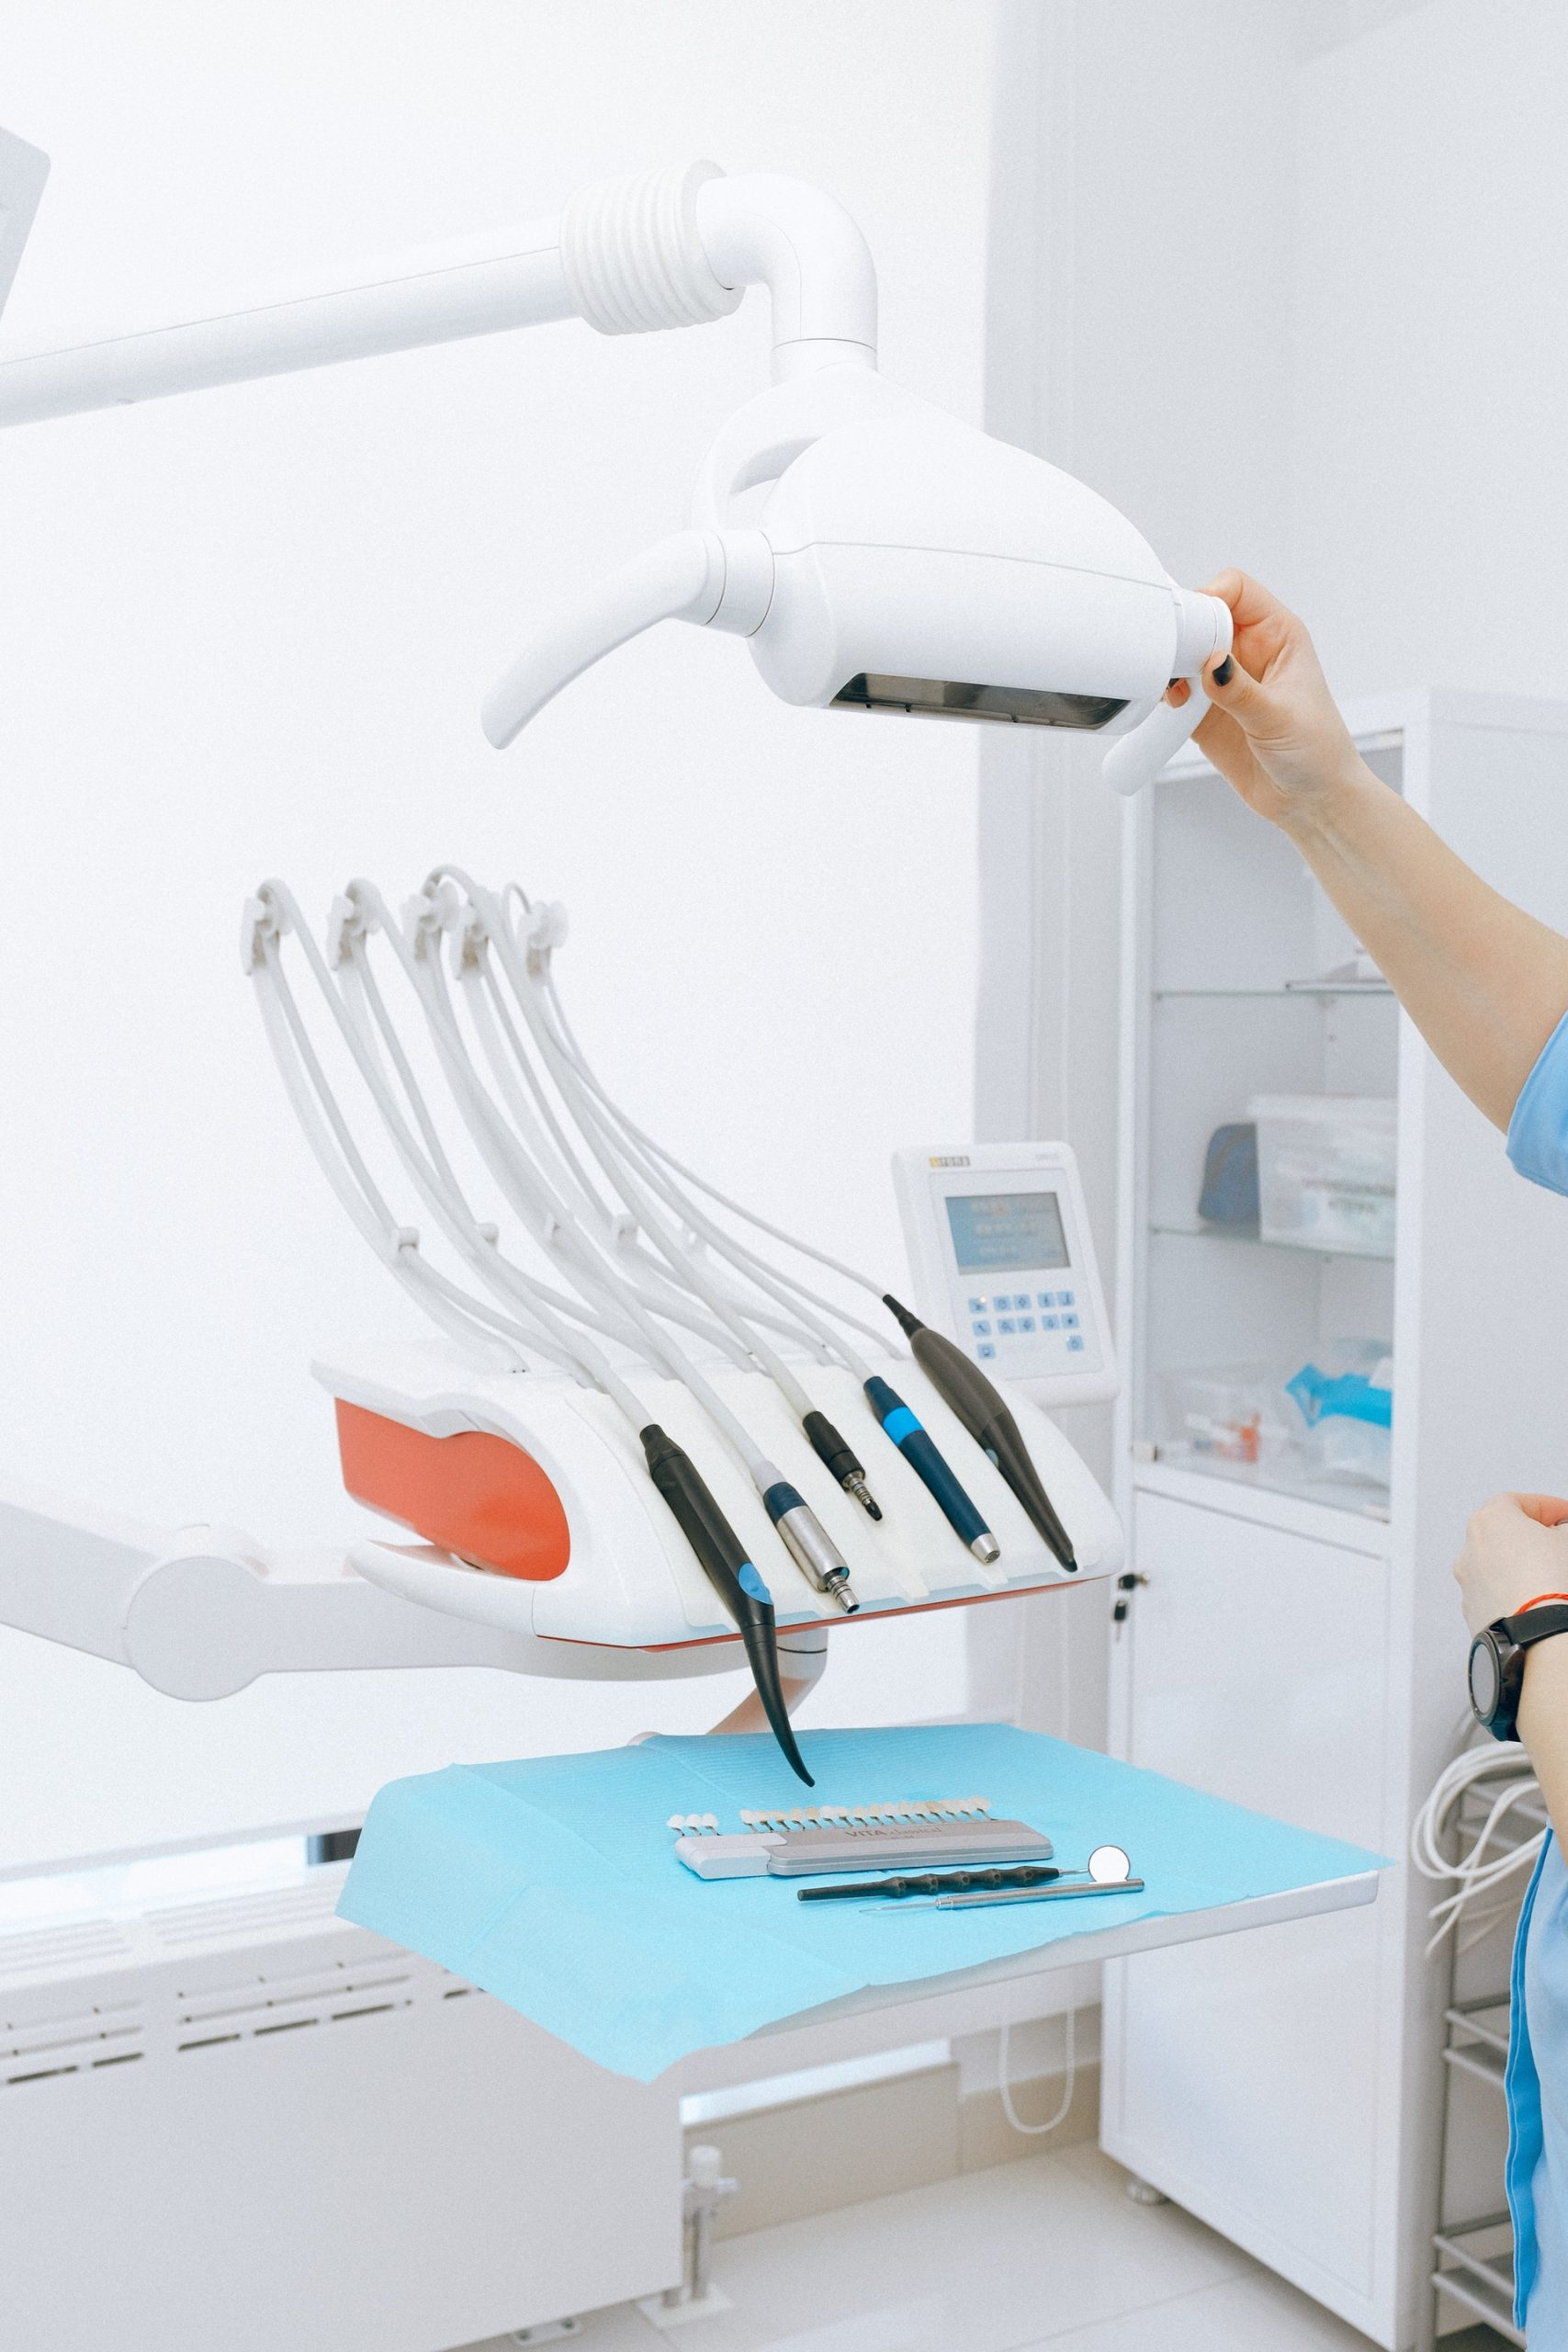 Implant Dentist | Dental Implants Ottawa | Endosteal Implant